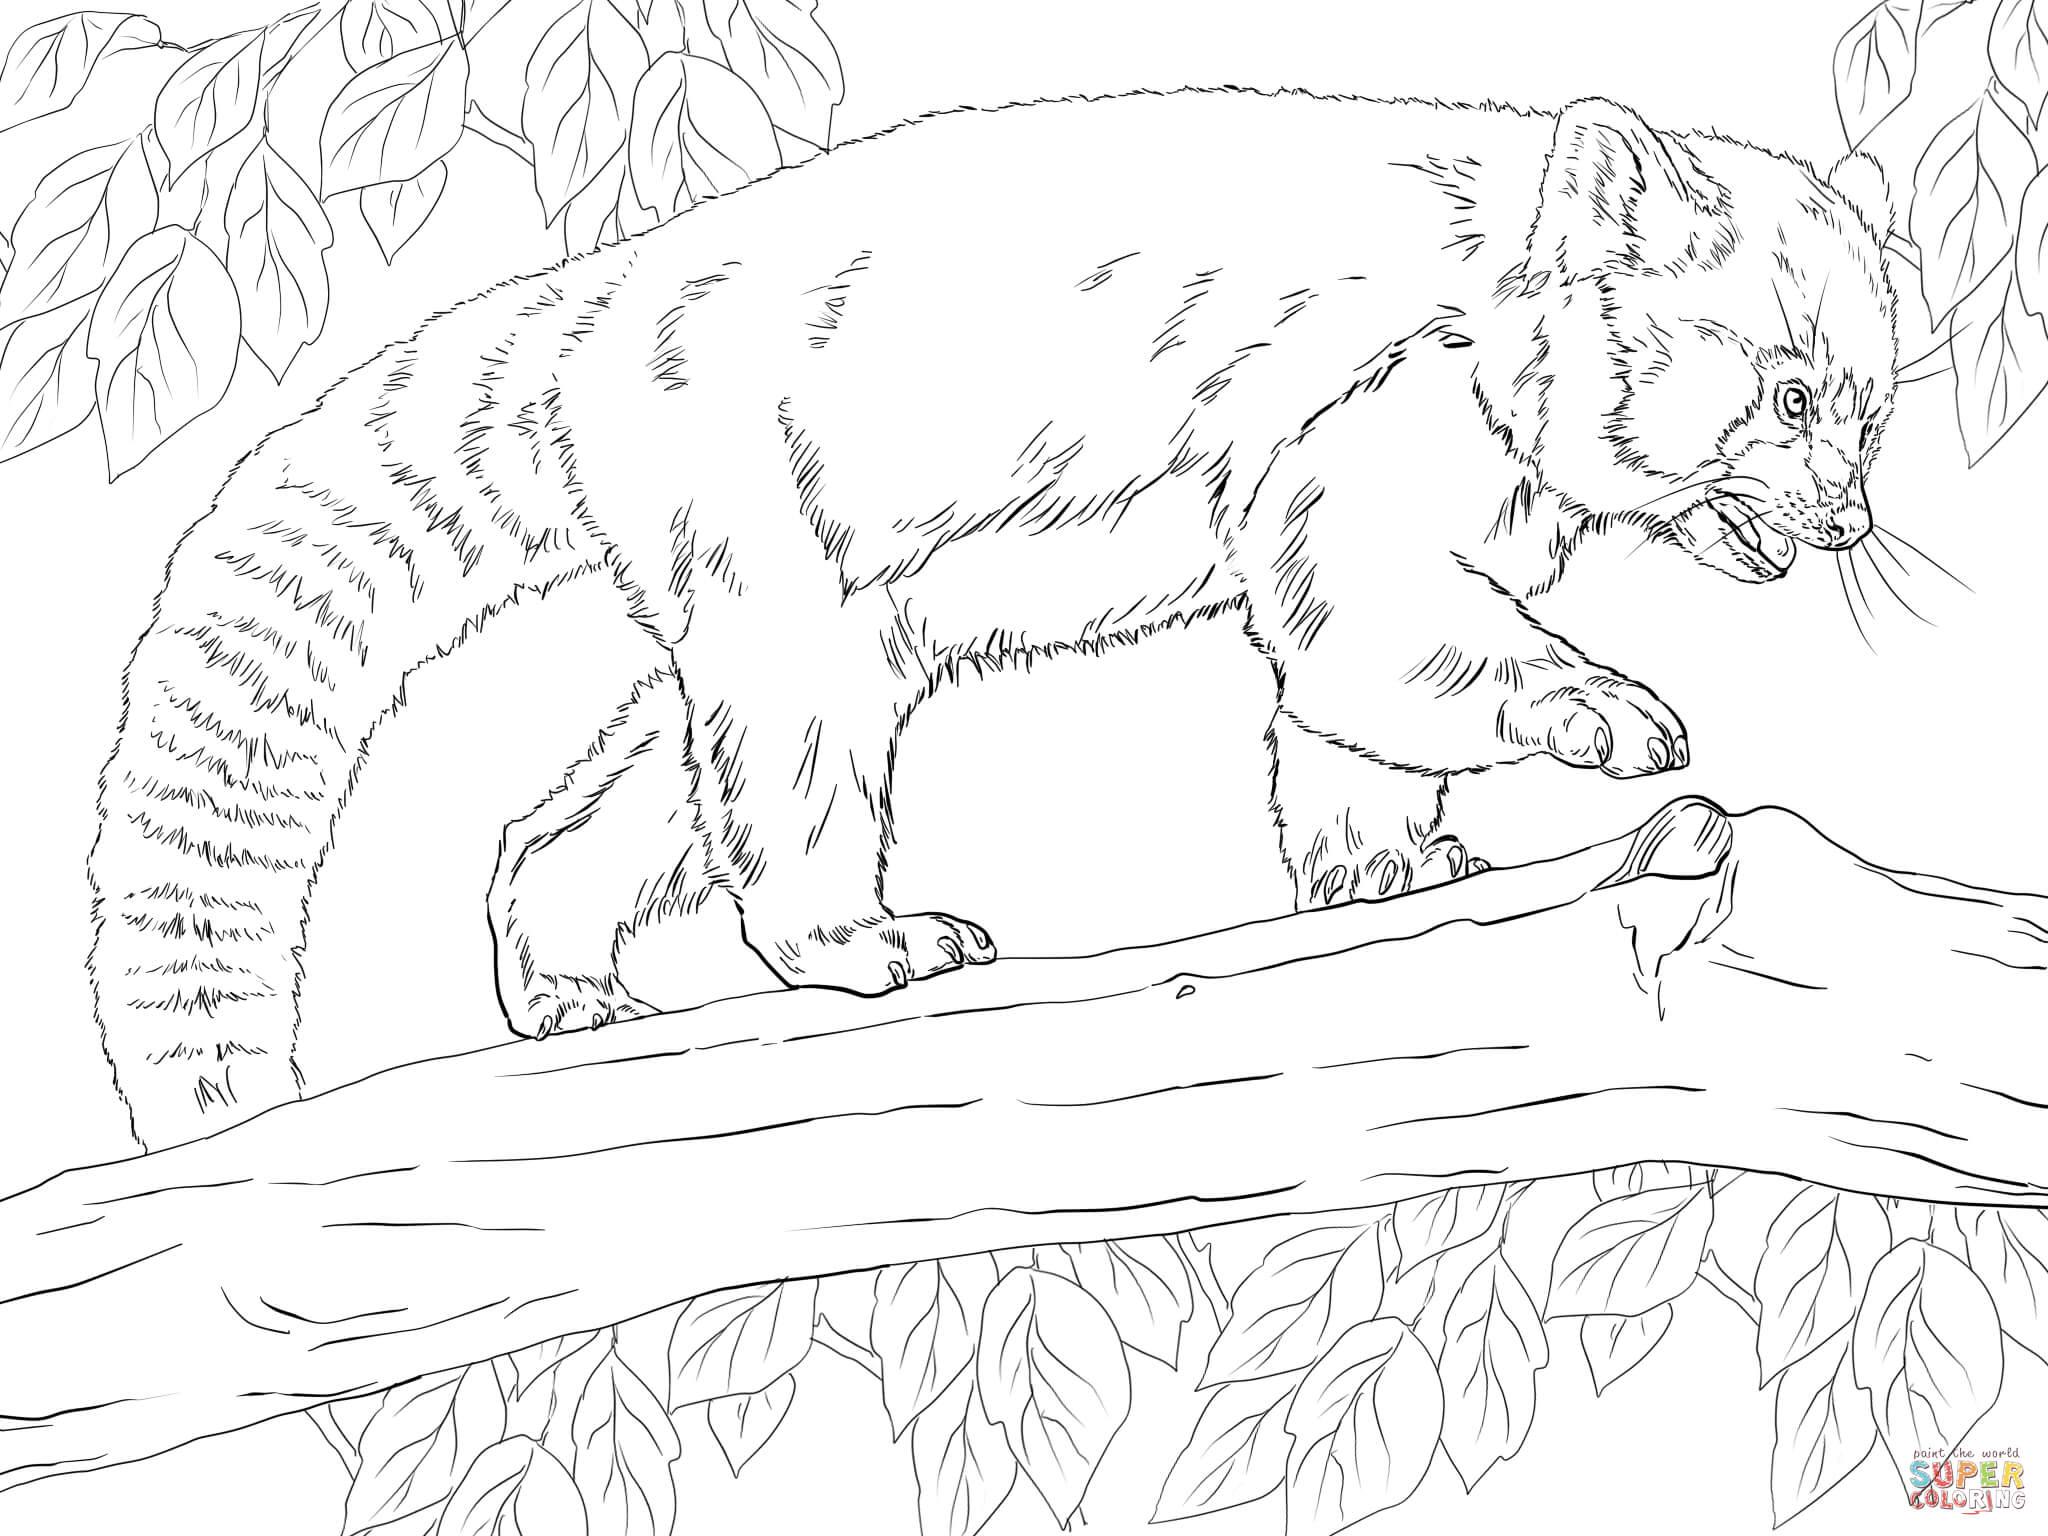 Realistic Panda Drawing at GetDrawings.com | Free for personal use ...